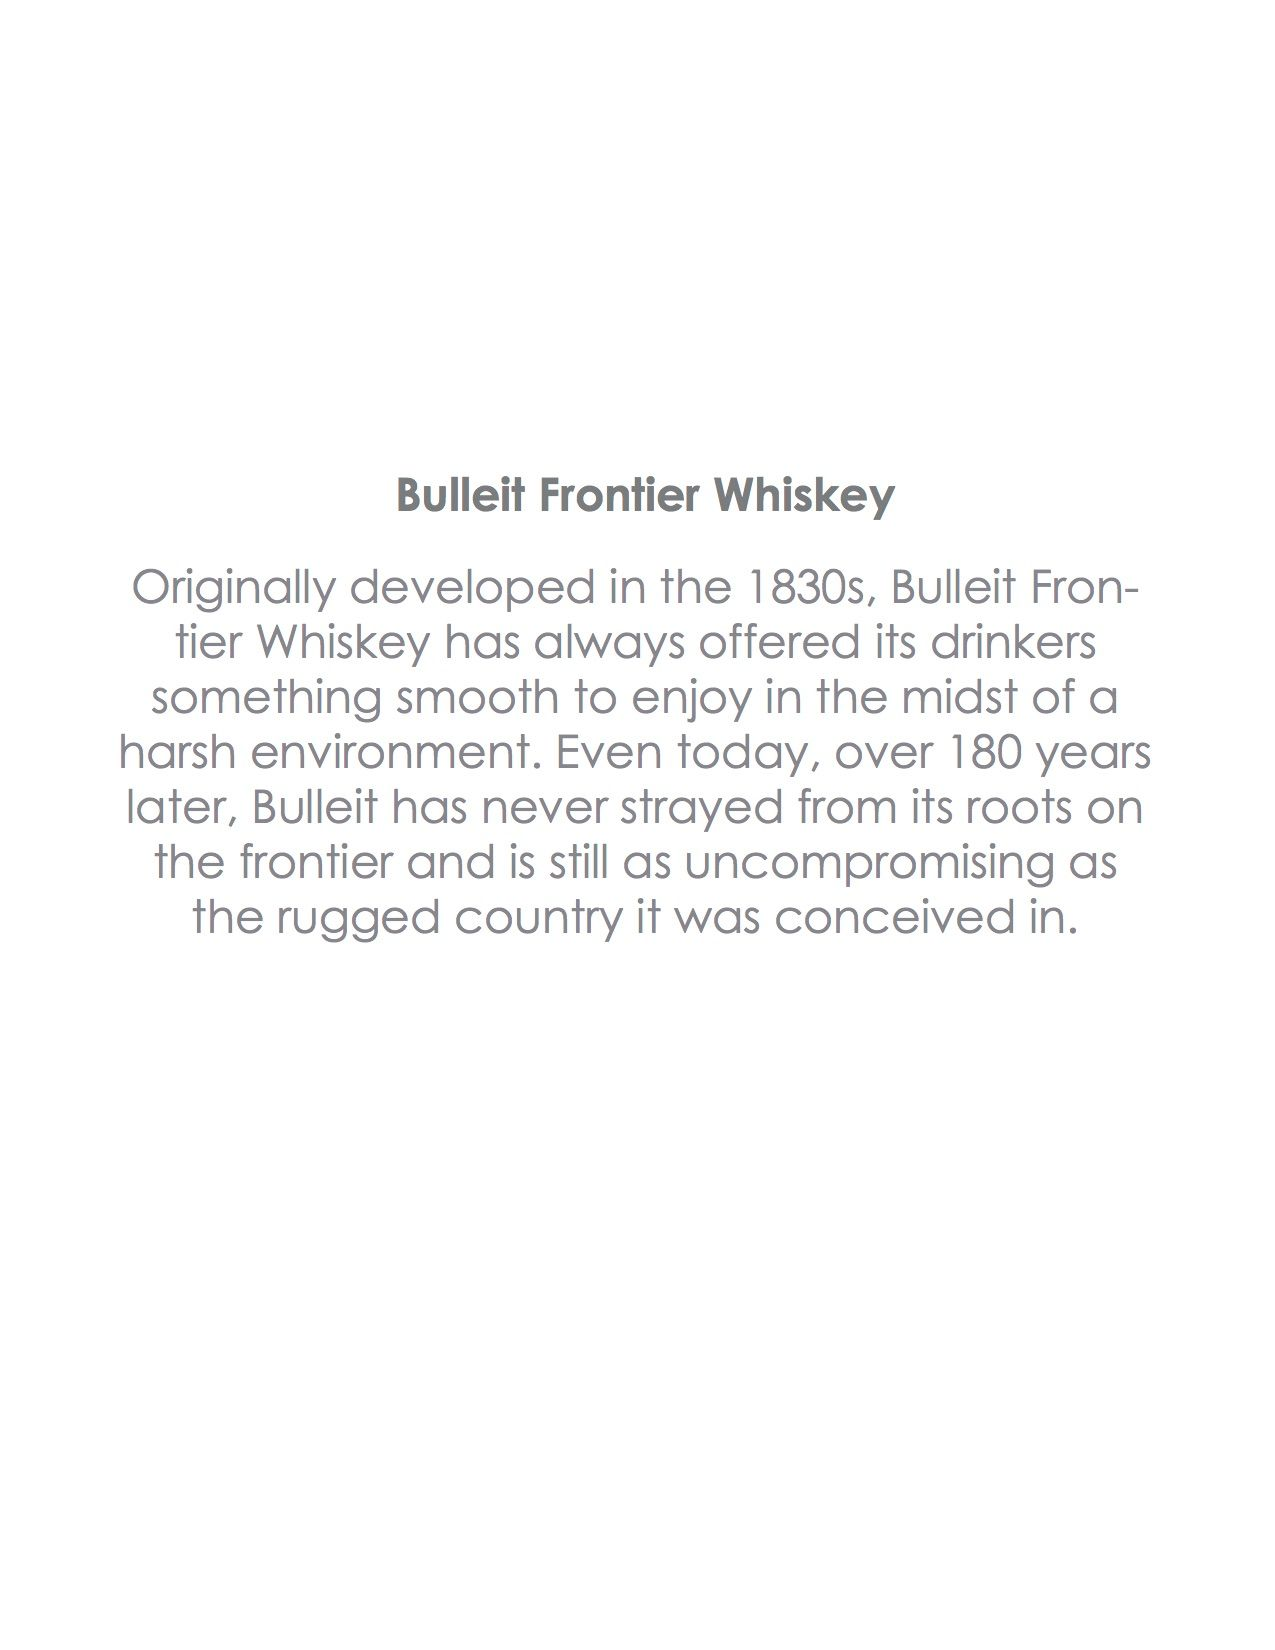 bulleit_frontier_whiskey-2.jpg